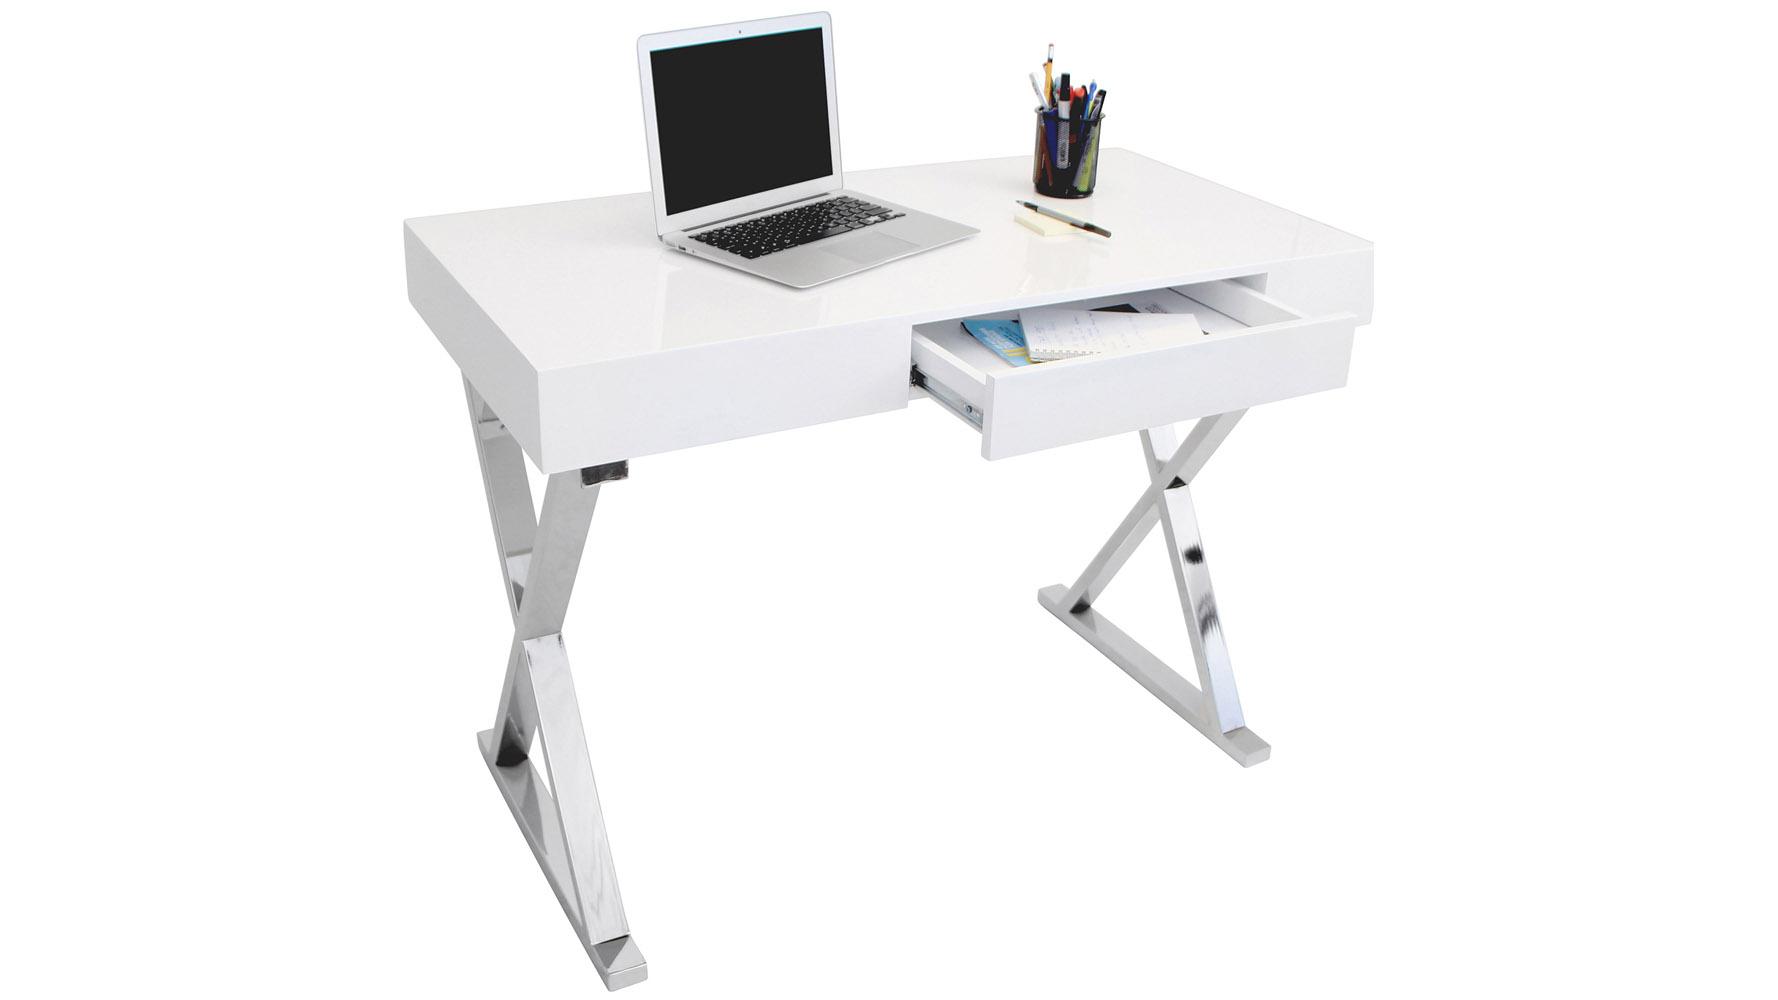 30 Inch Desk Hostgarcia : modernwhitelacquerandchromeequisdesk7513543563284 from www.hostgarcia.com size 1778 x 1000 jpeg 107kB